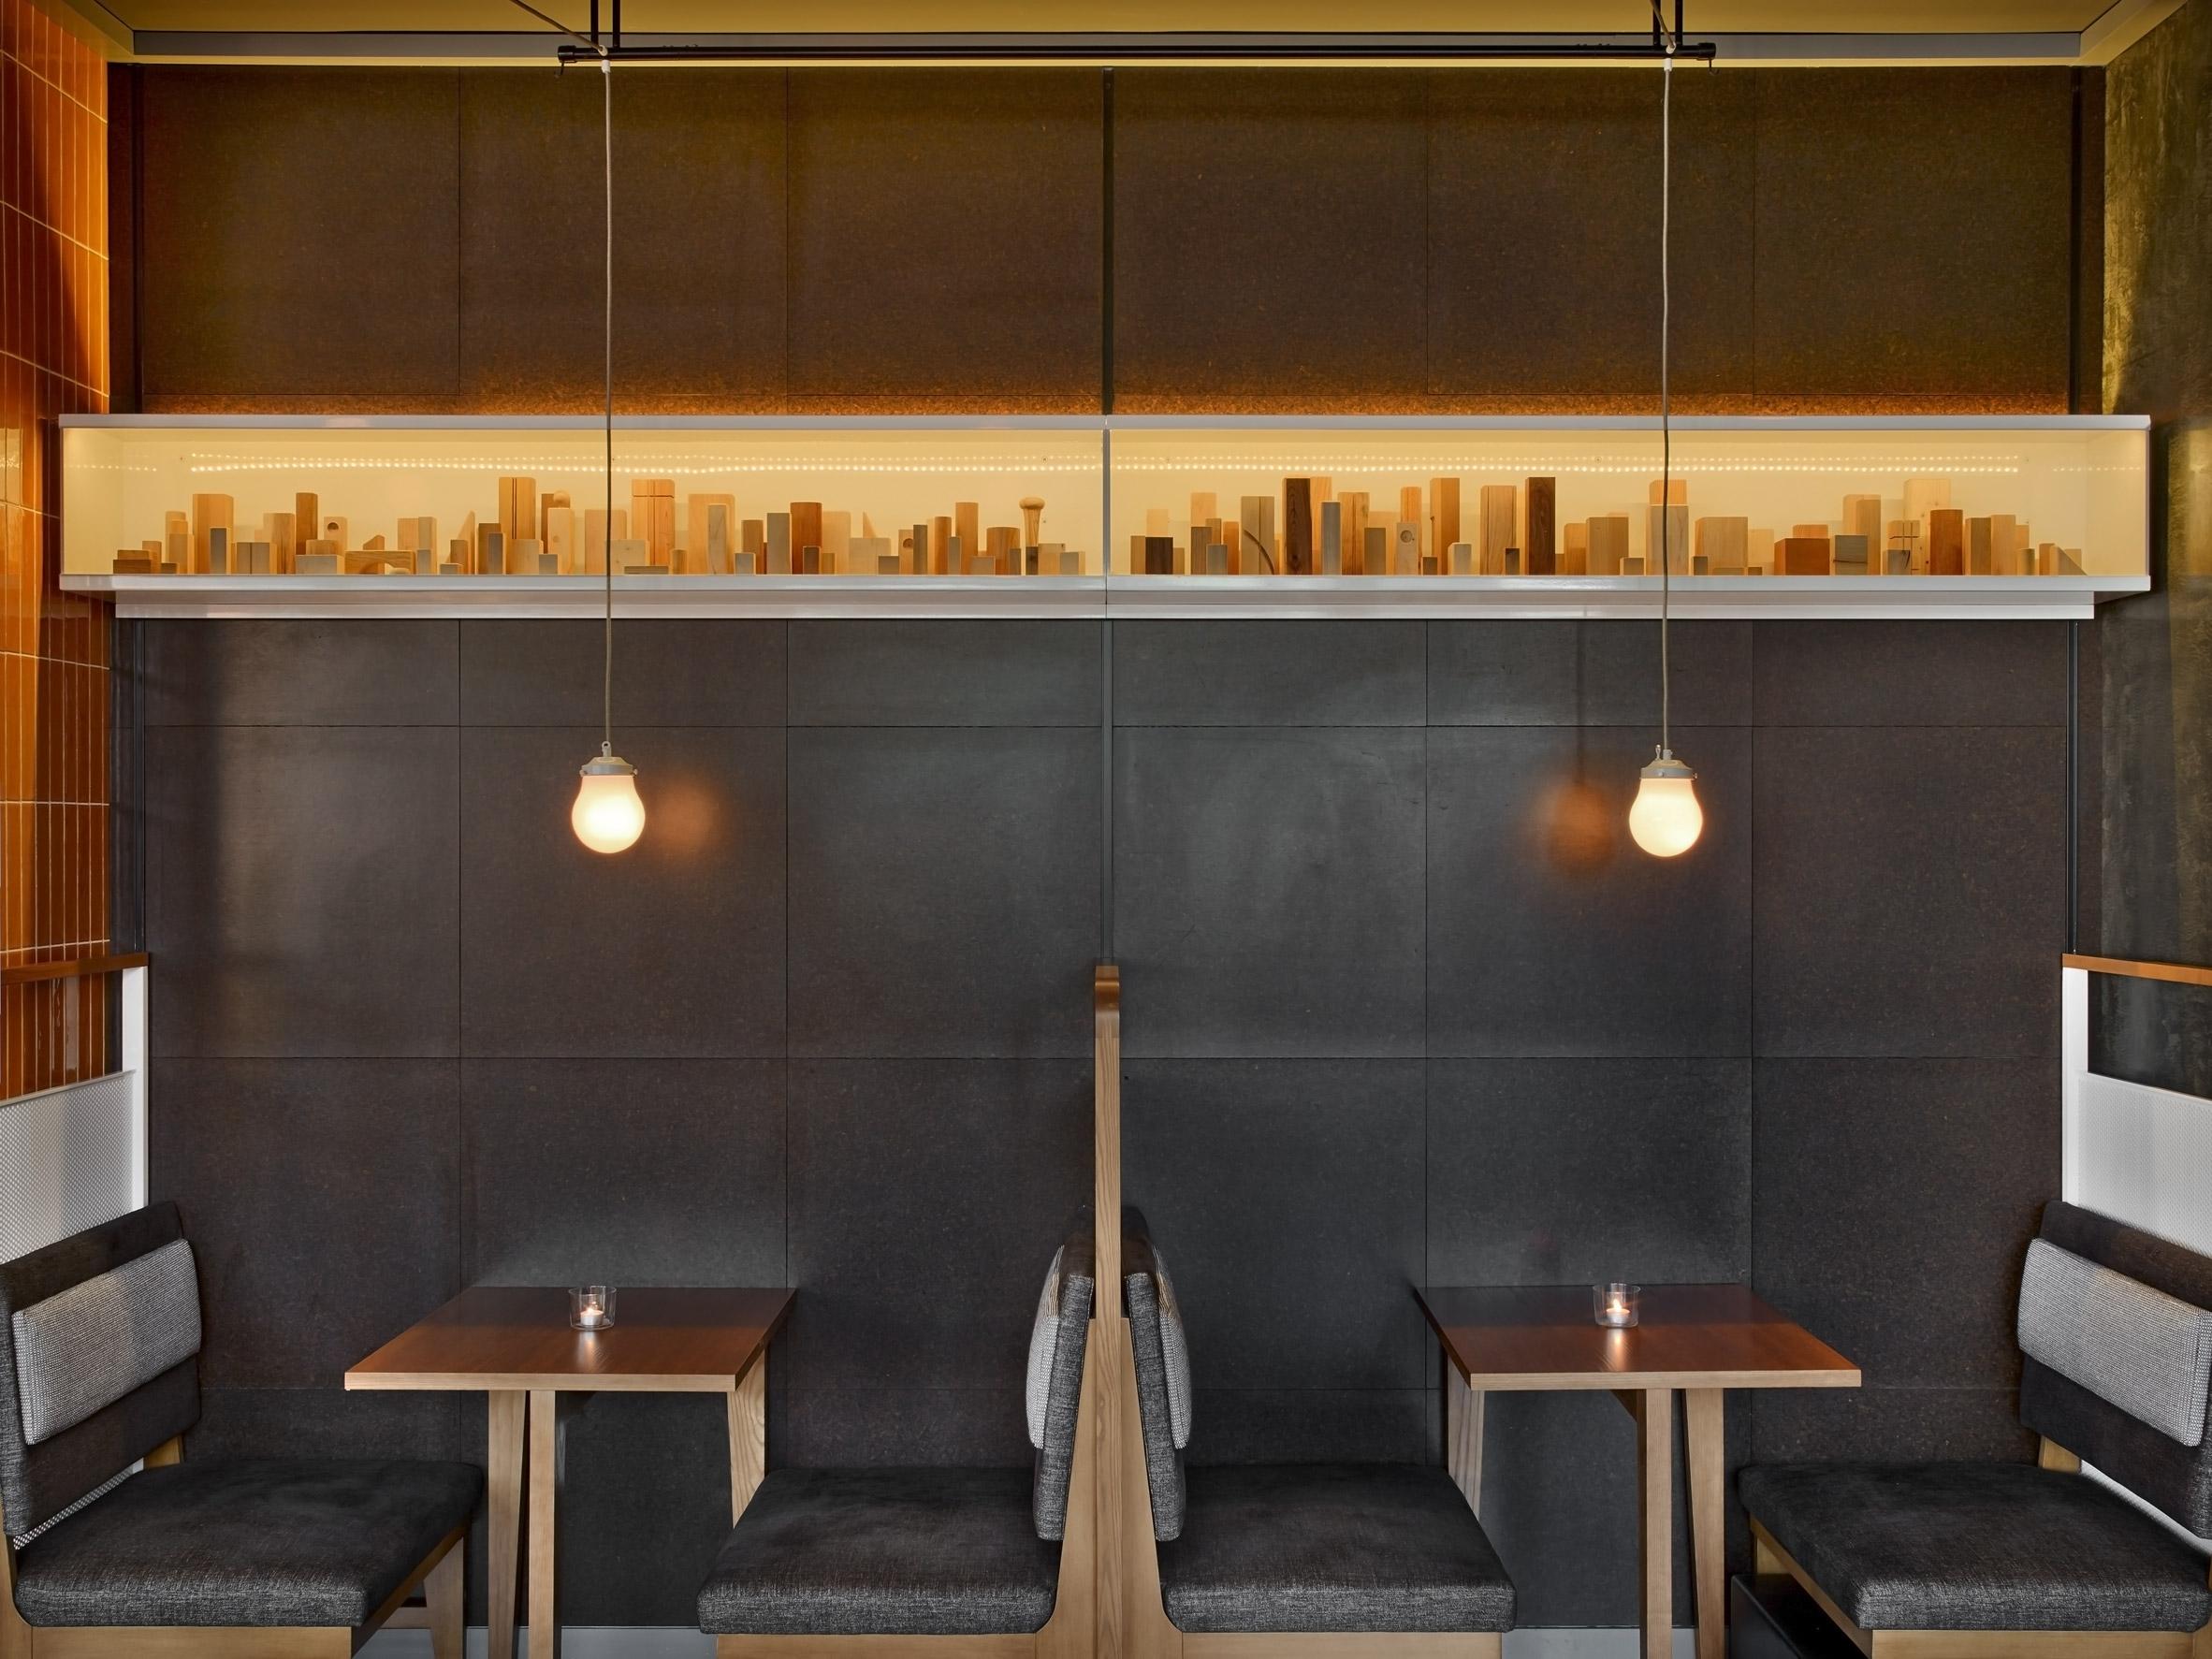 architecture-new-york-city-micro-hotel-design-studia-interiors-osnovadesign-osnova-poltava_14